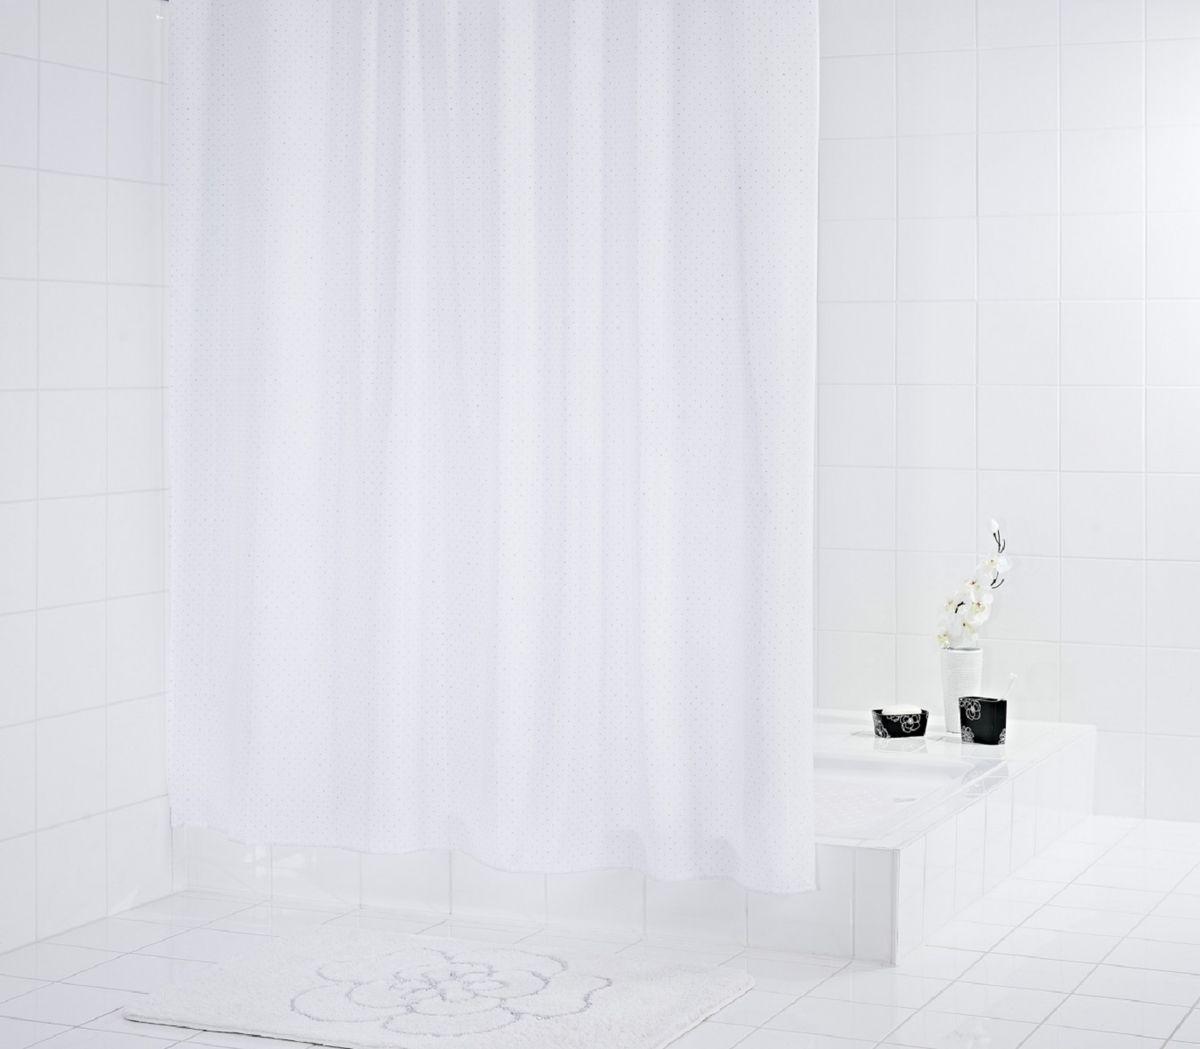 Штора для ванной комнаты Ridder Diamond, цвет: белый , 180 х 200 см штора для ванной комнаты ridder helgoland цвет синий голубой 240 х 180 см